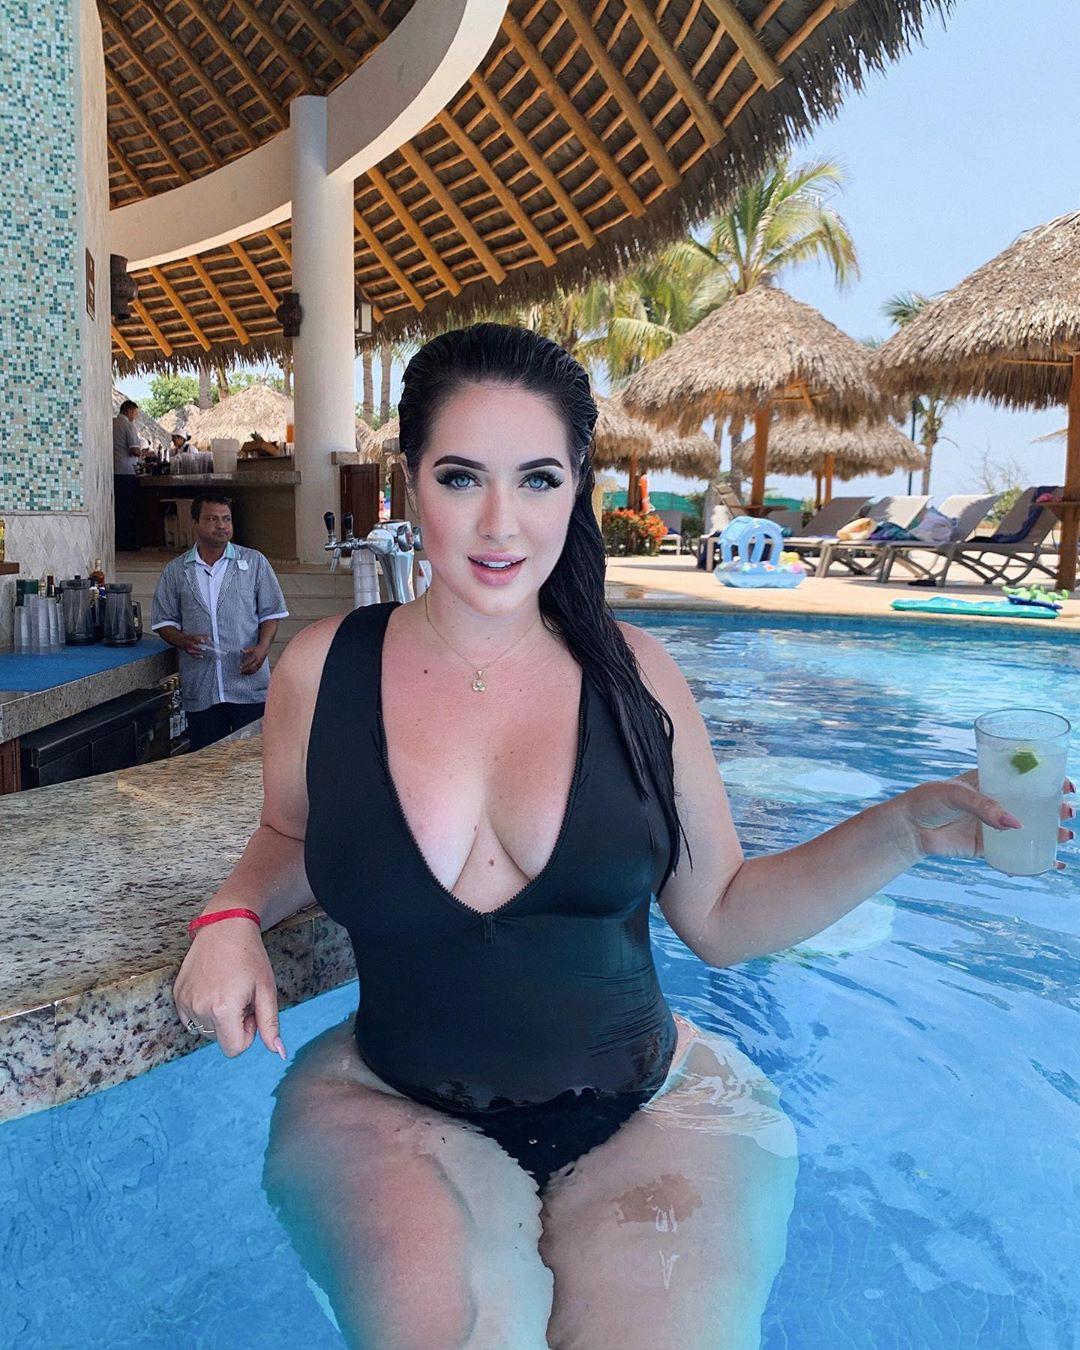 Holly Luyah bikini style inspiration swimwear attire, fine legs